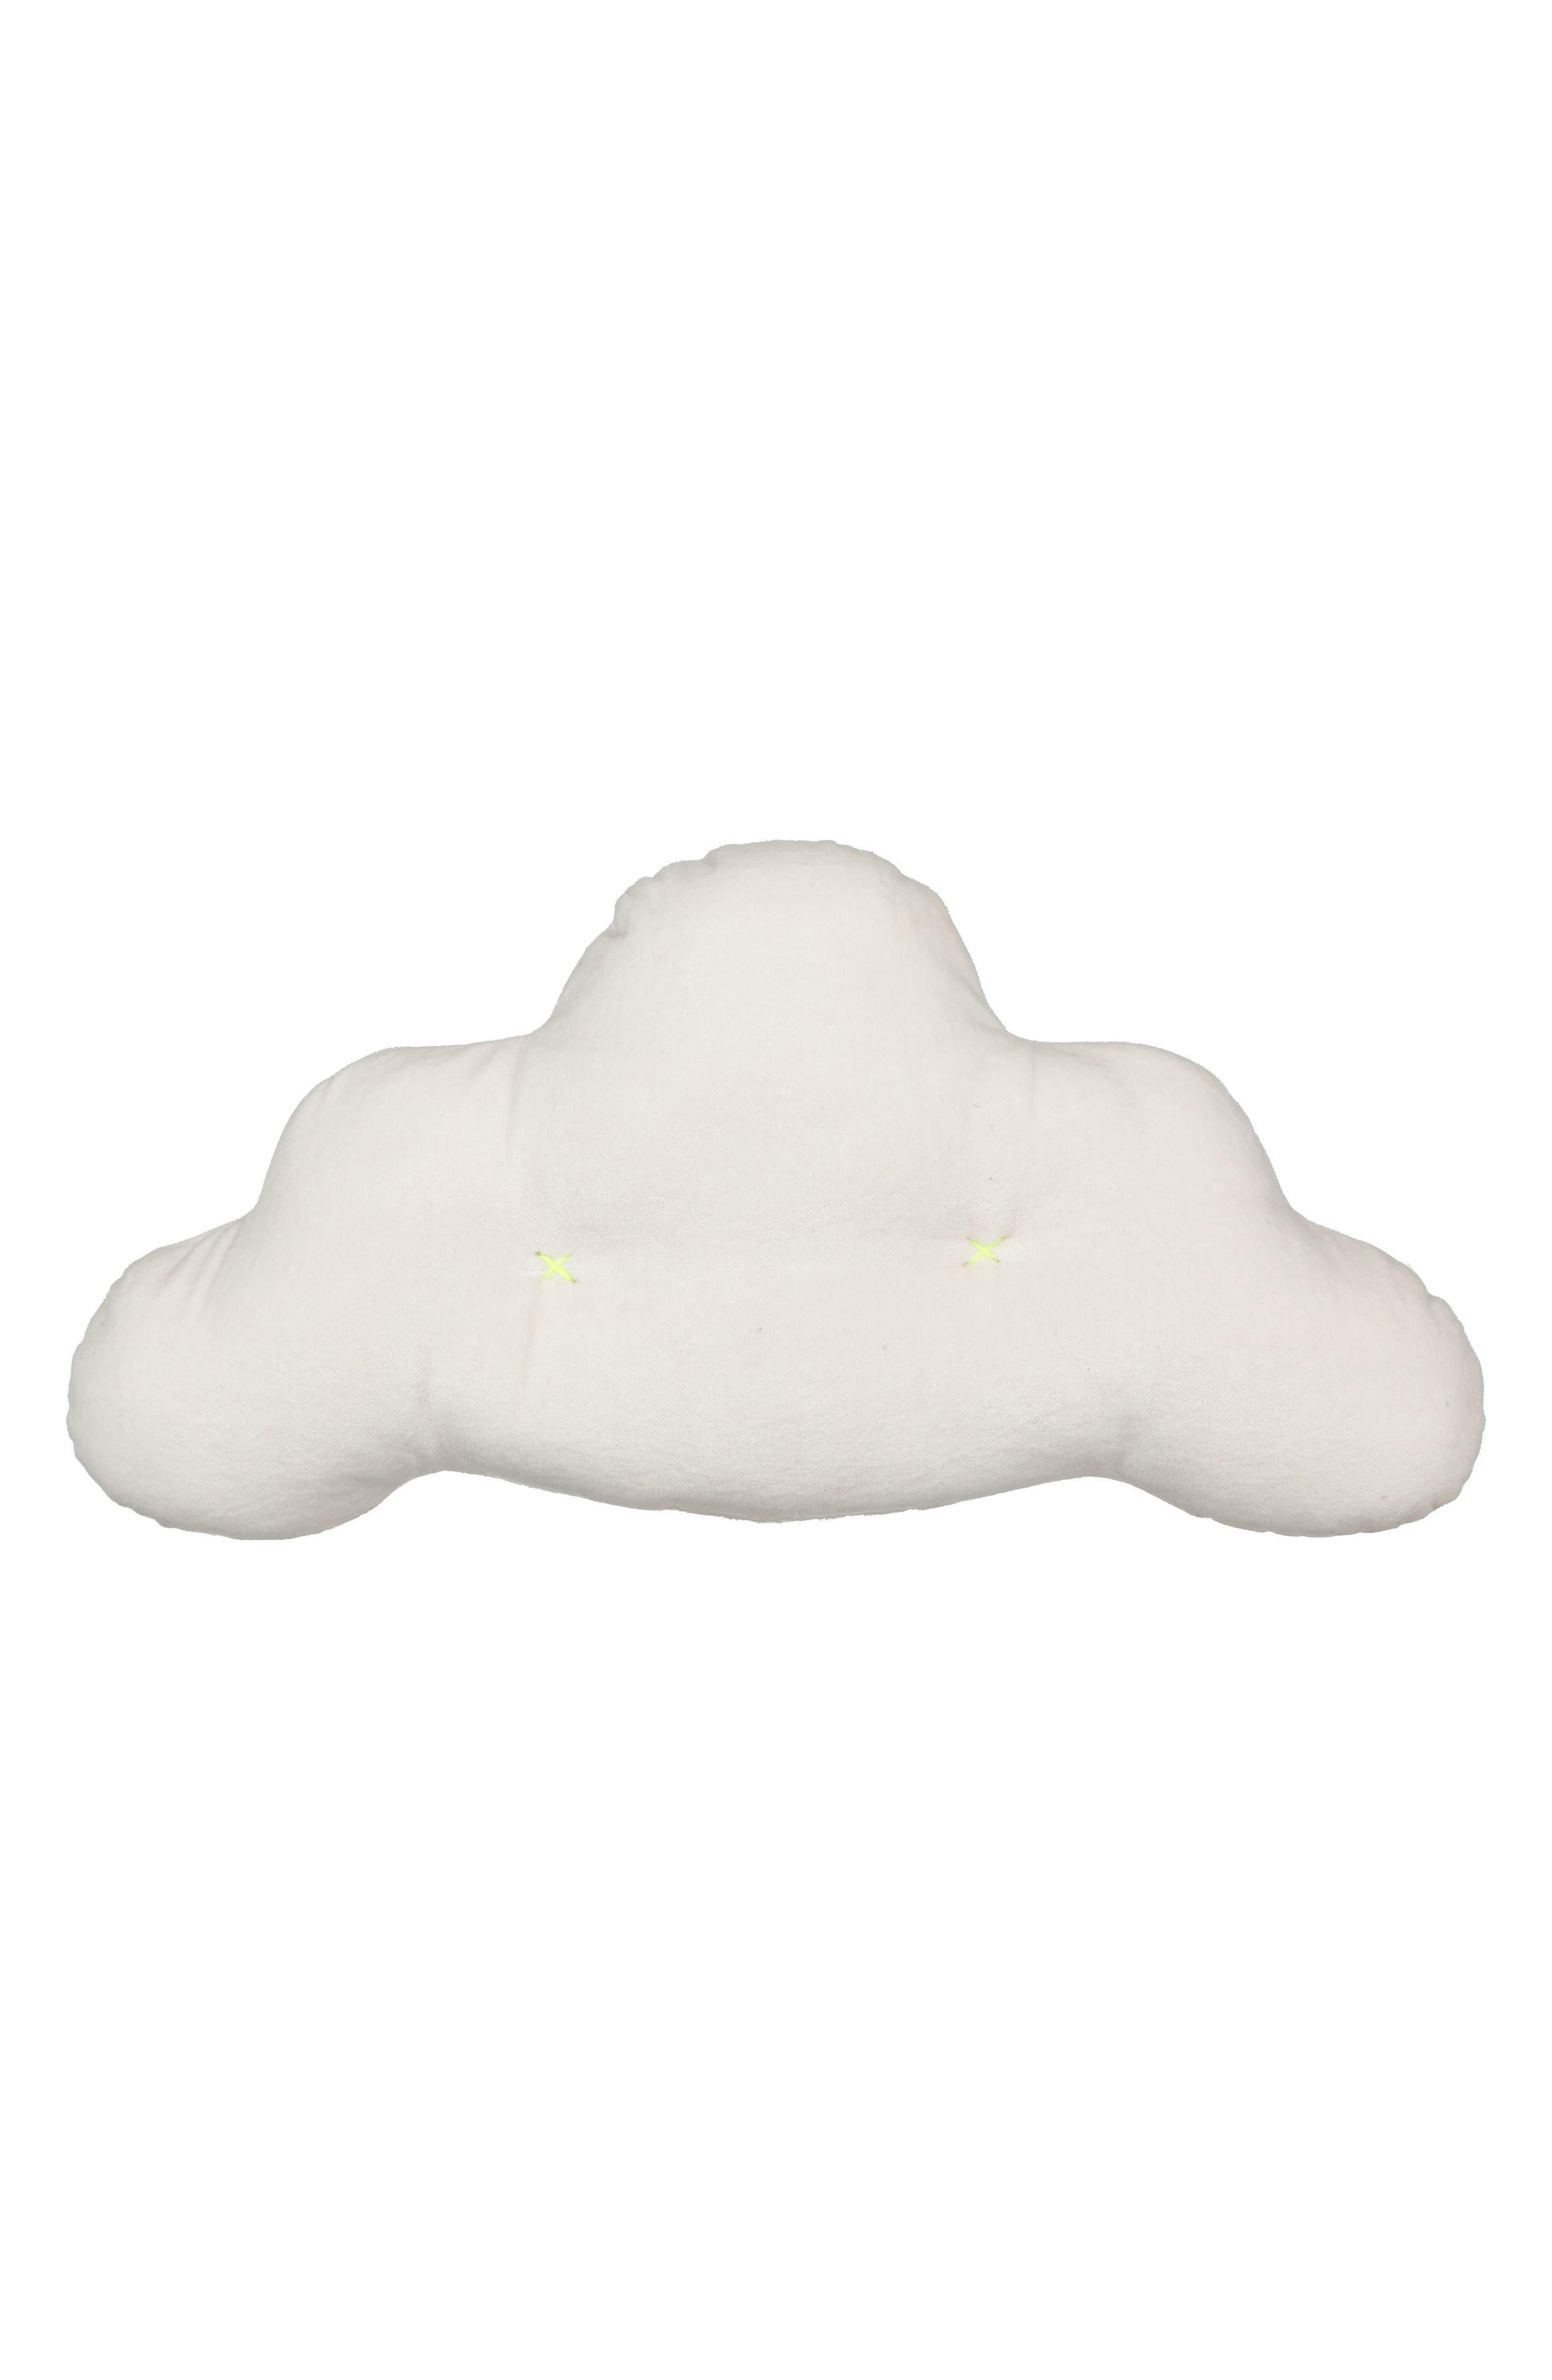 Main Image - Meri Meri Velvet Cloud Pillow